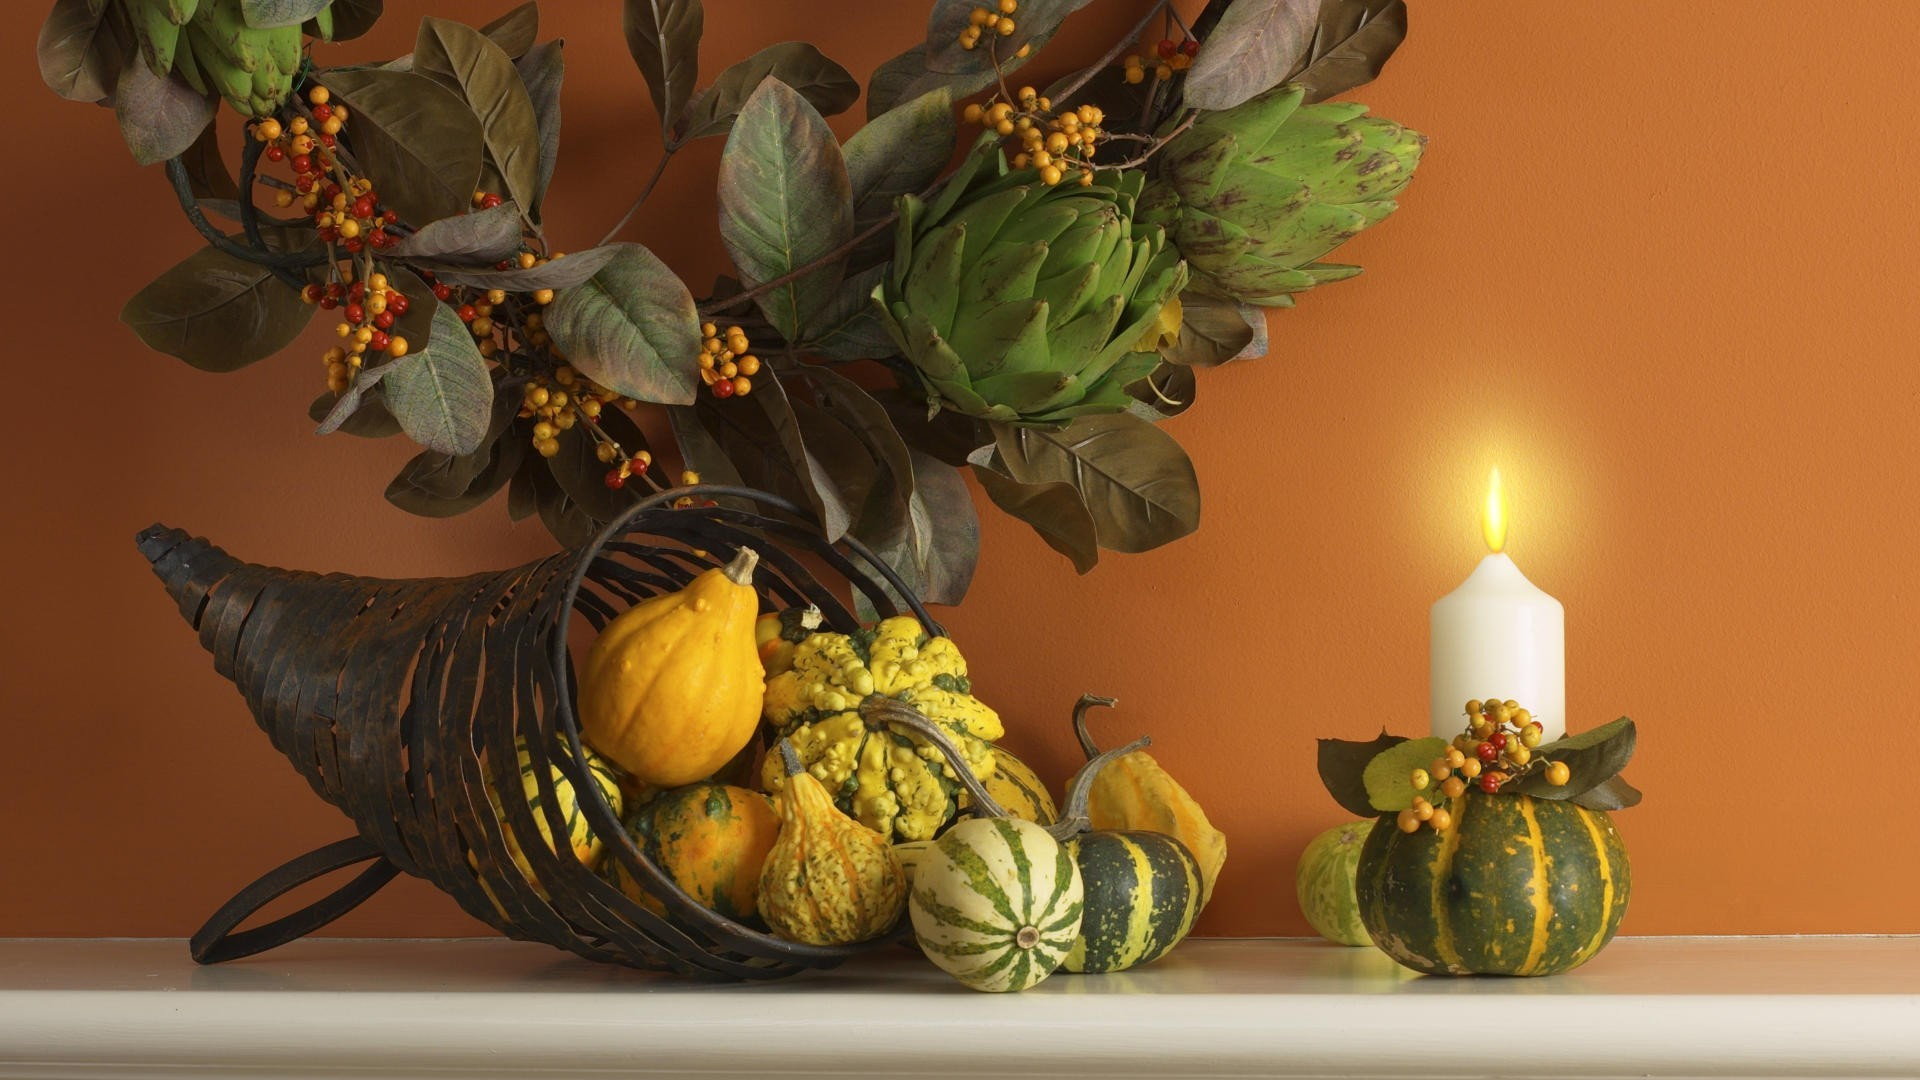 Thanksgiving Desktop Wallpapers.